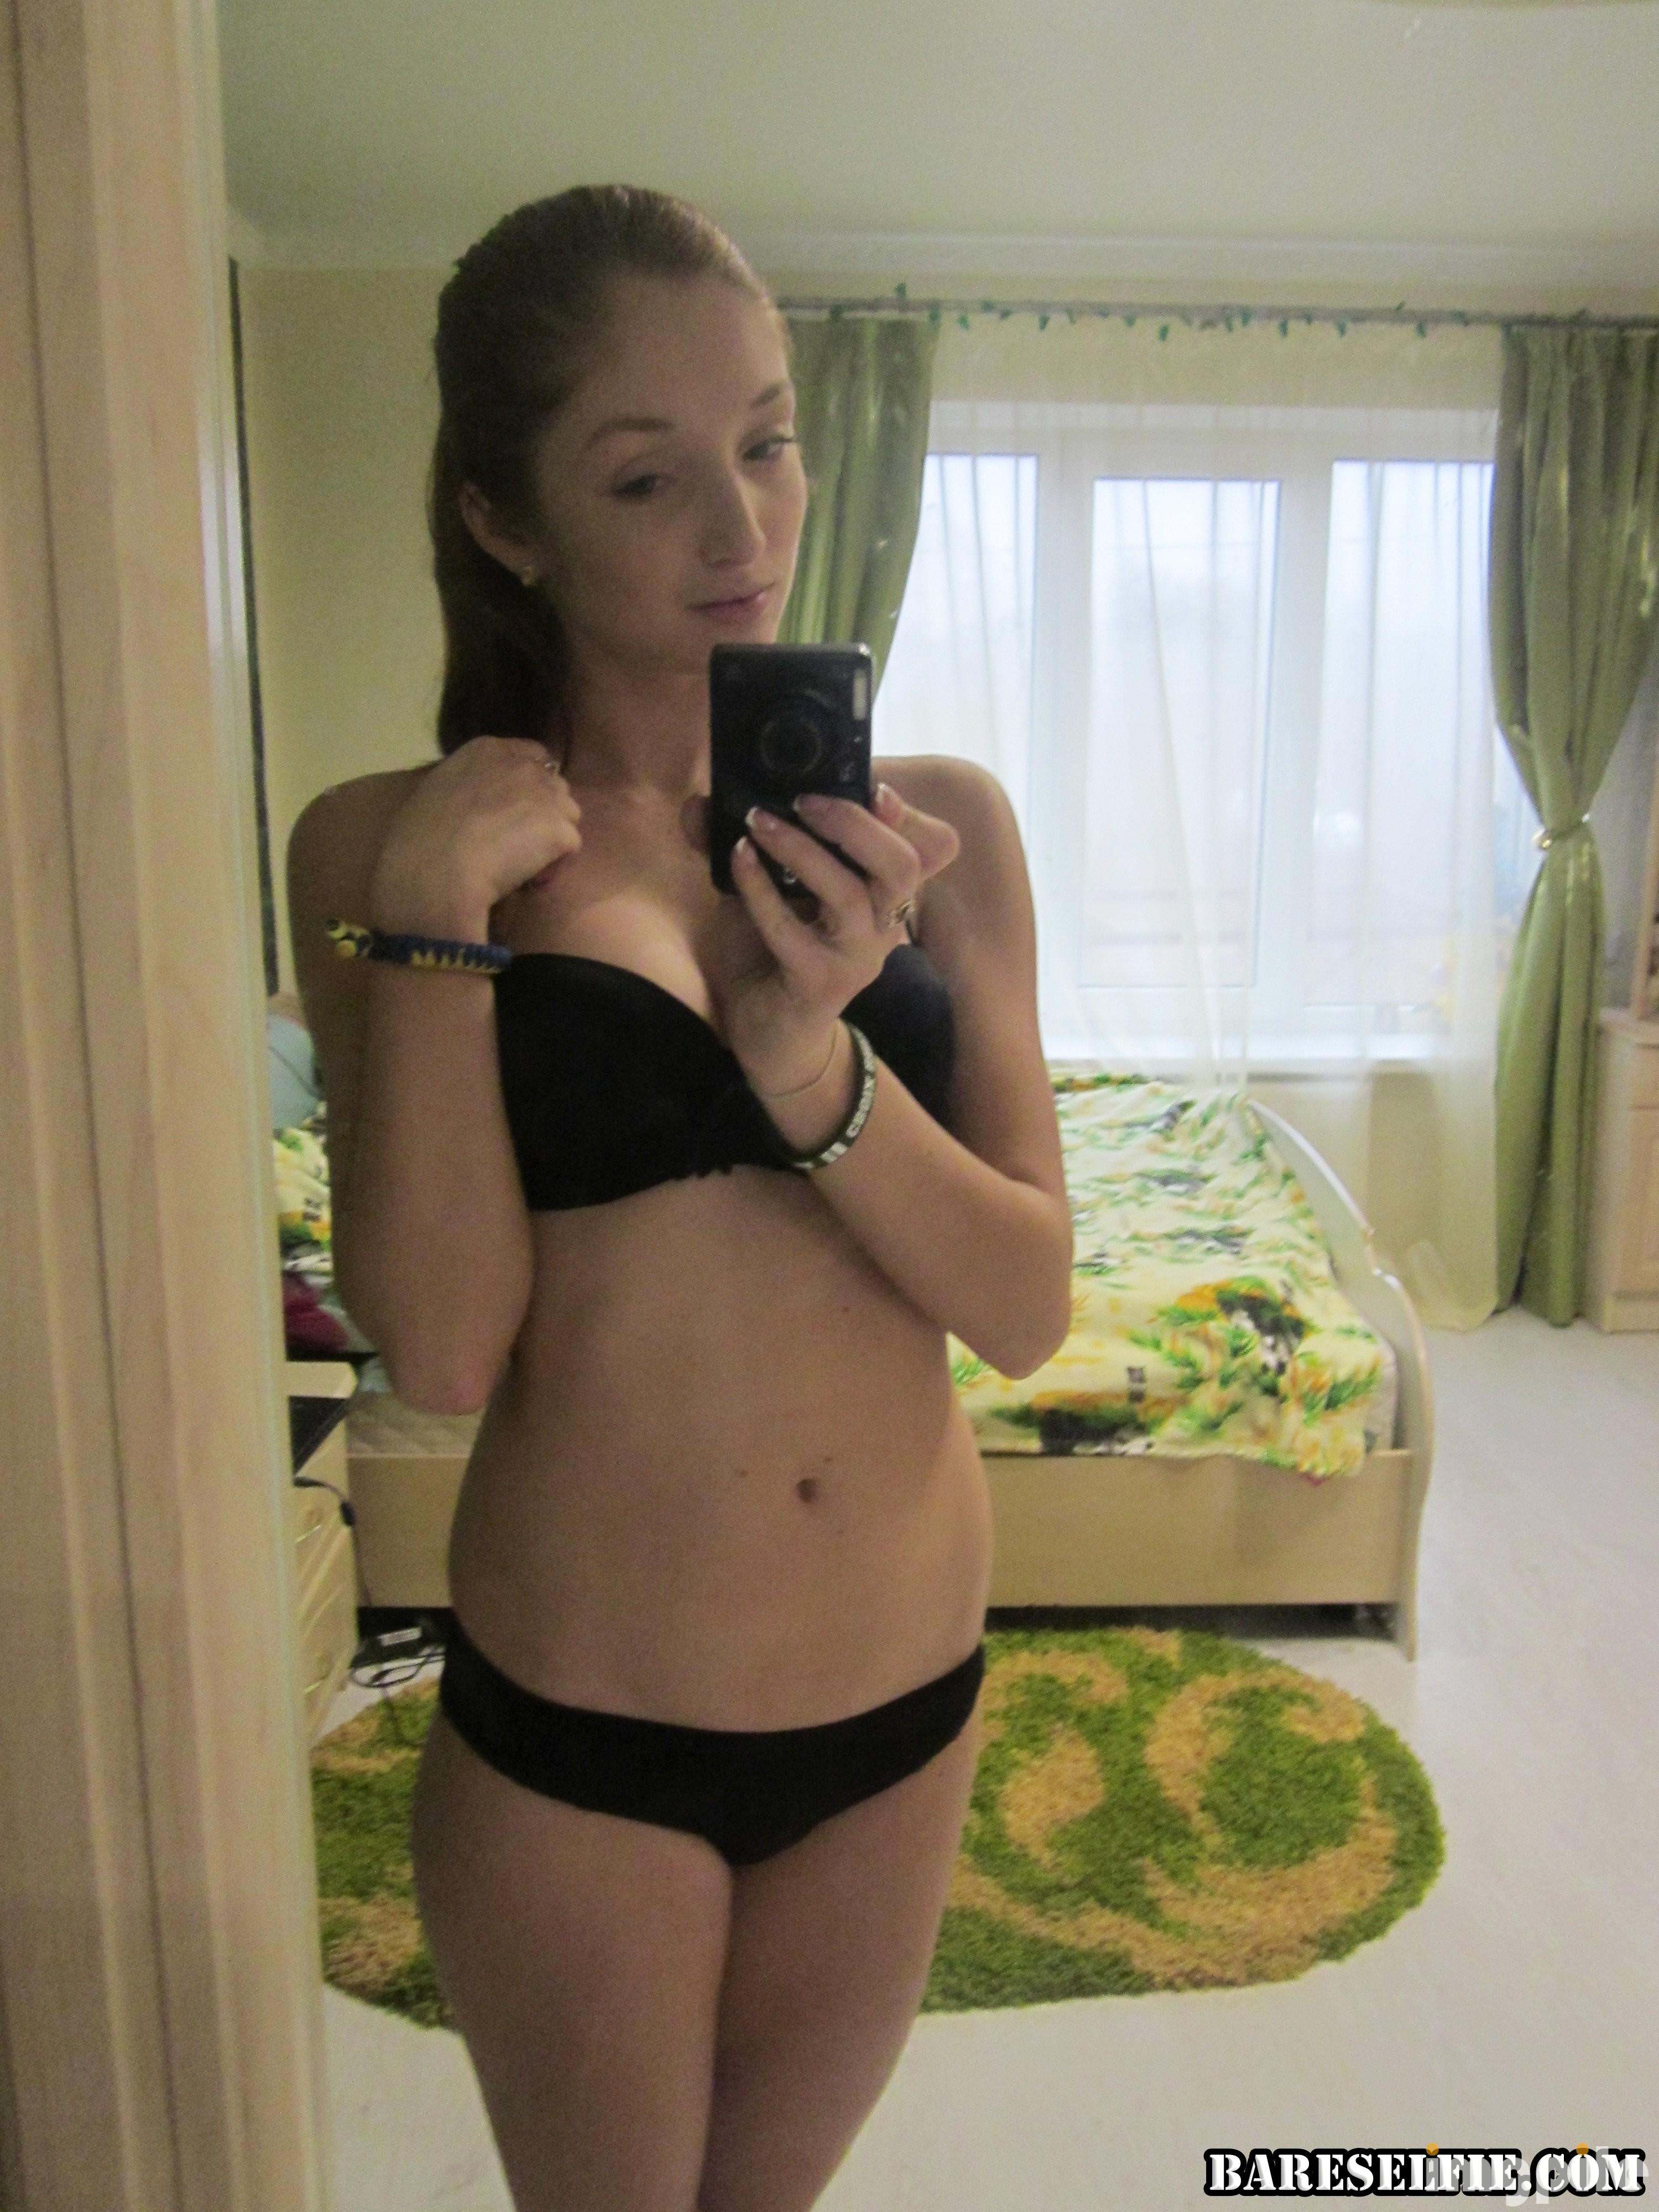 selfie Naked iphone girl